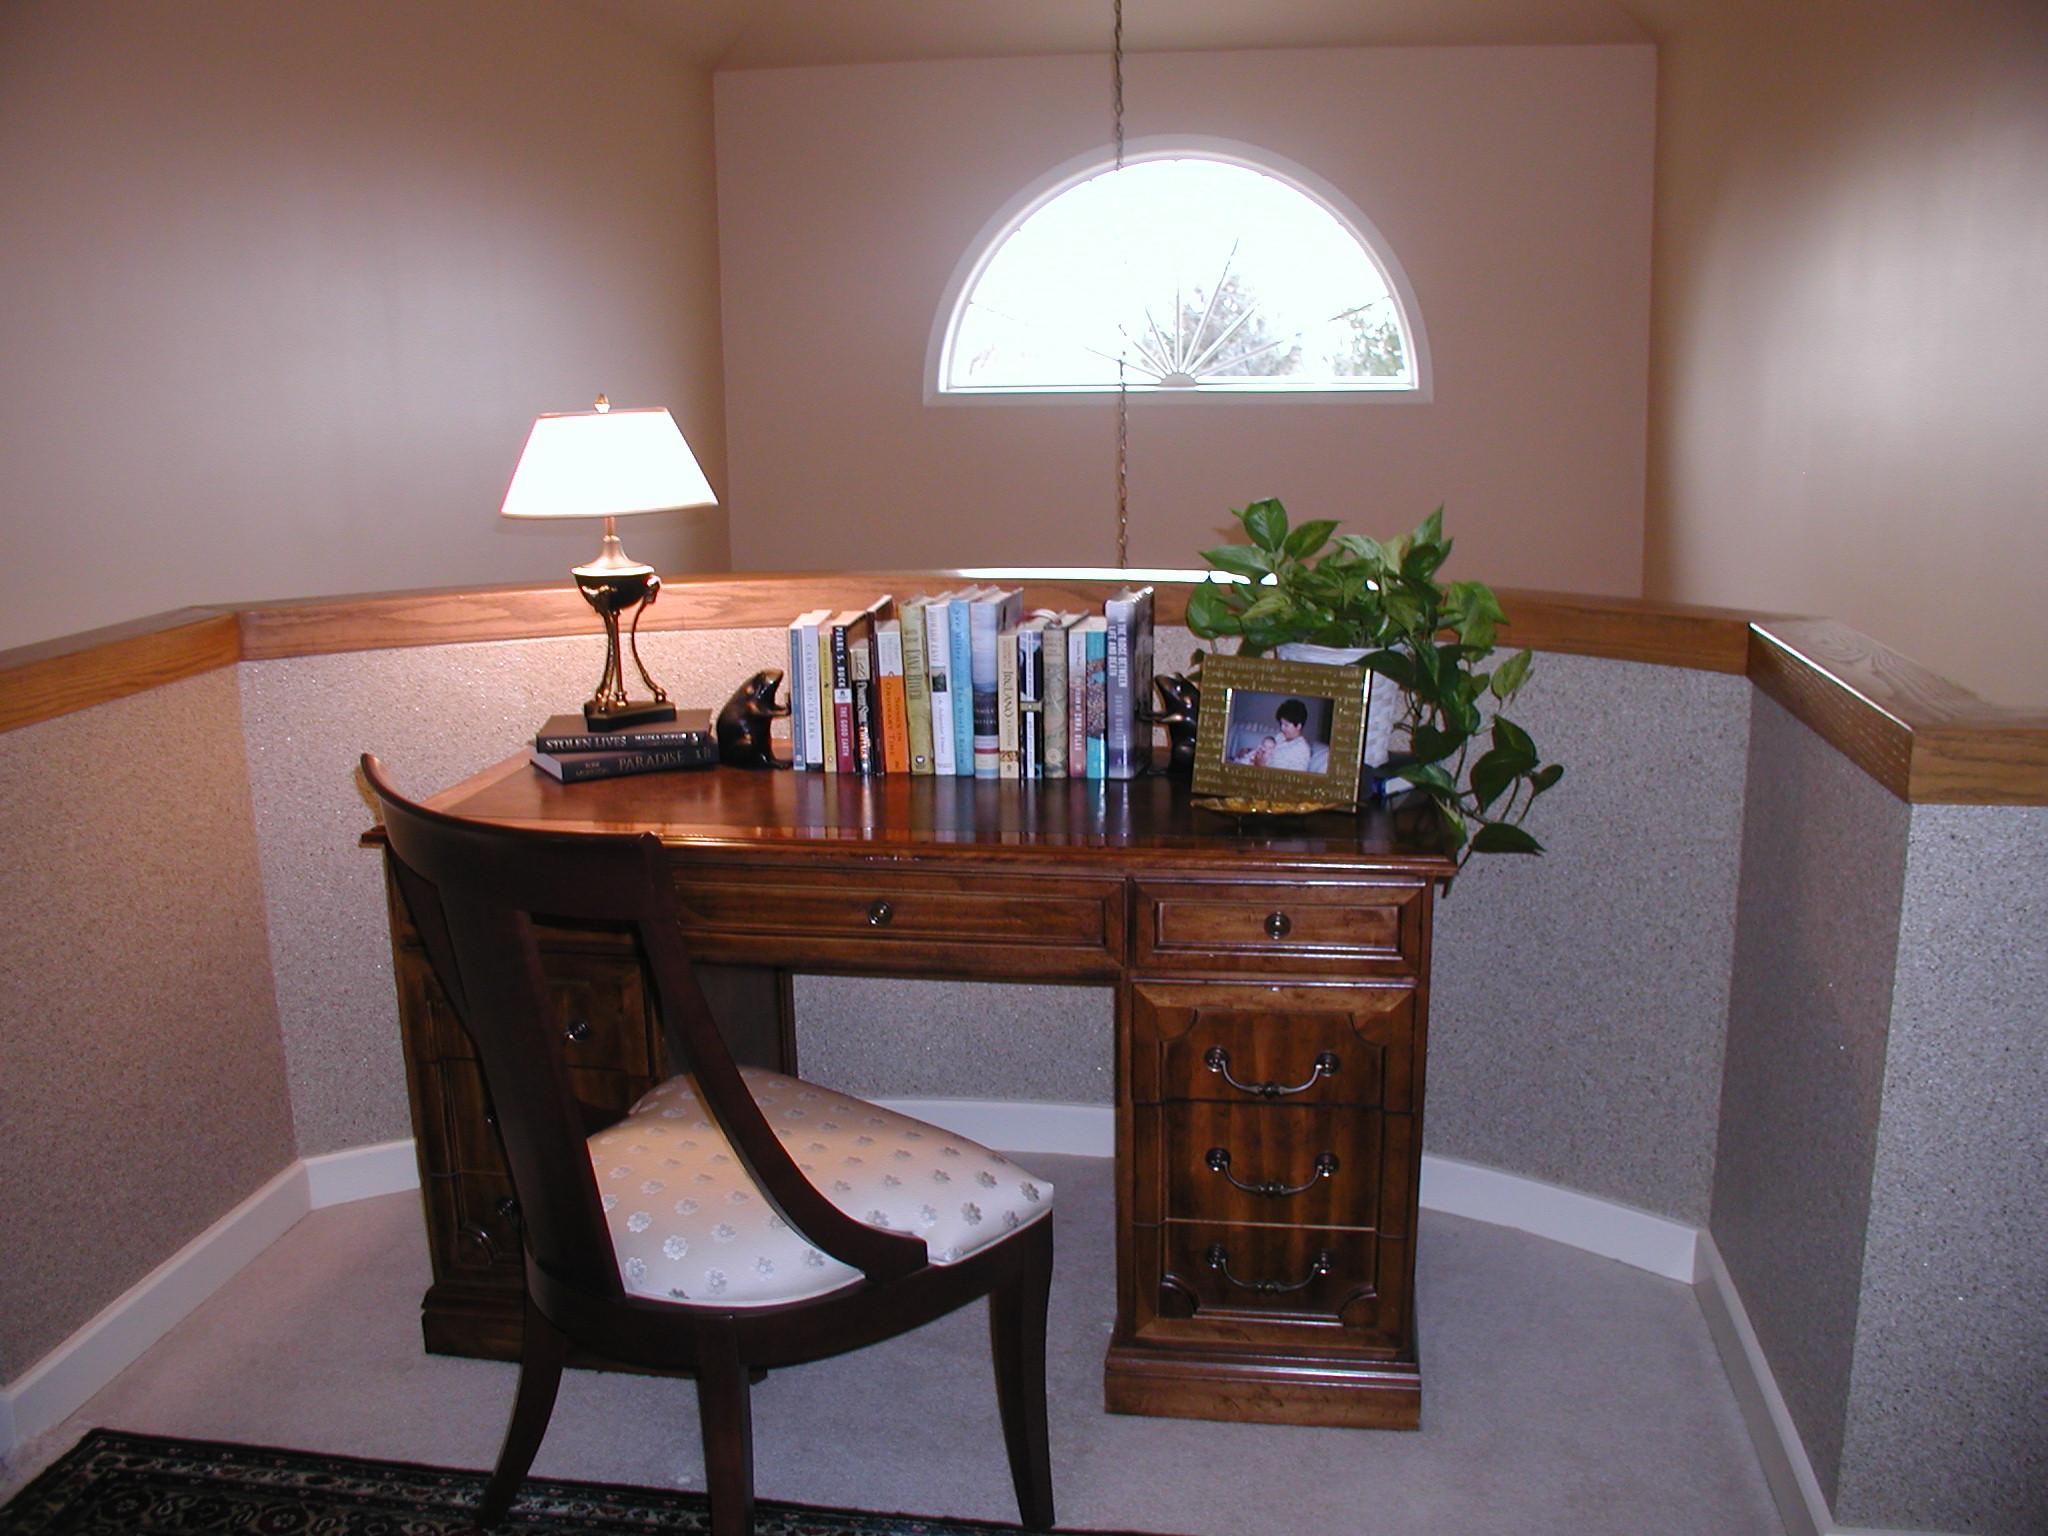 Terri's Interior Design Home office photos